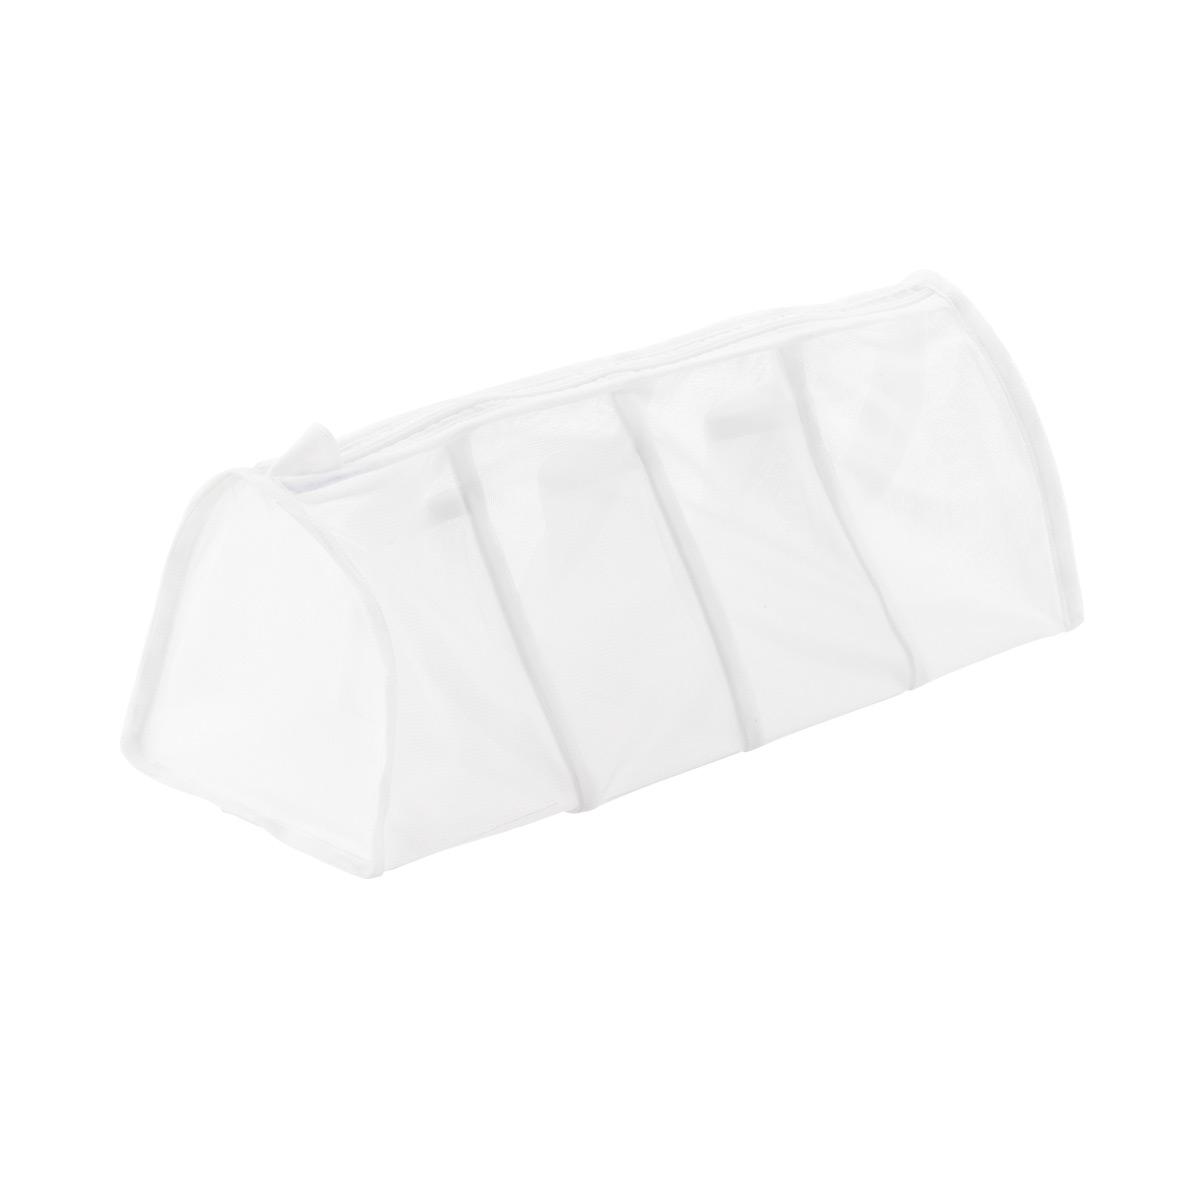 Delicates + Wash 4-Section Bag